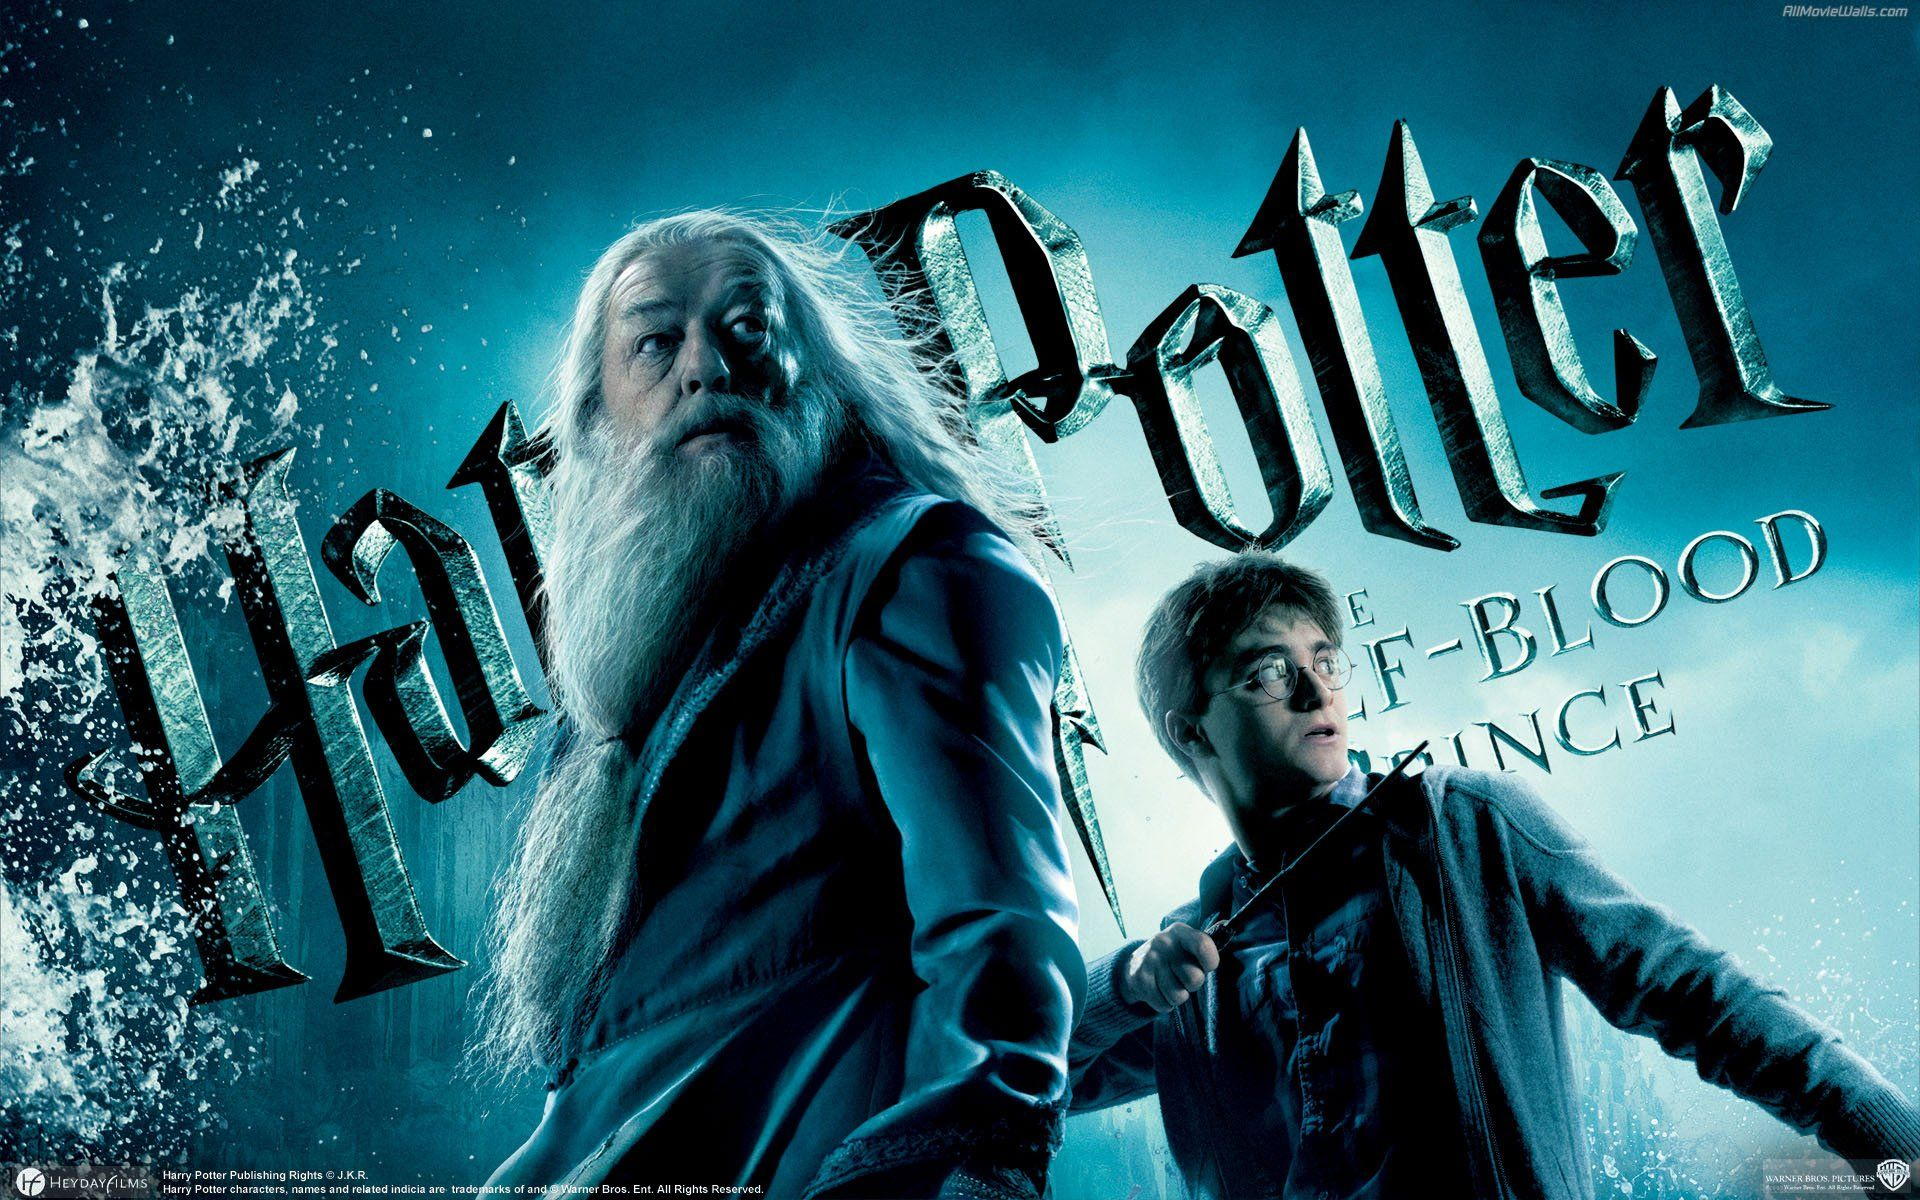 обои на рабочий стол-Гарри Поттер - Поиск в Google | Гарри ...